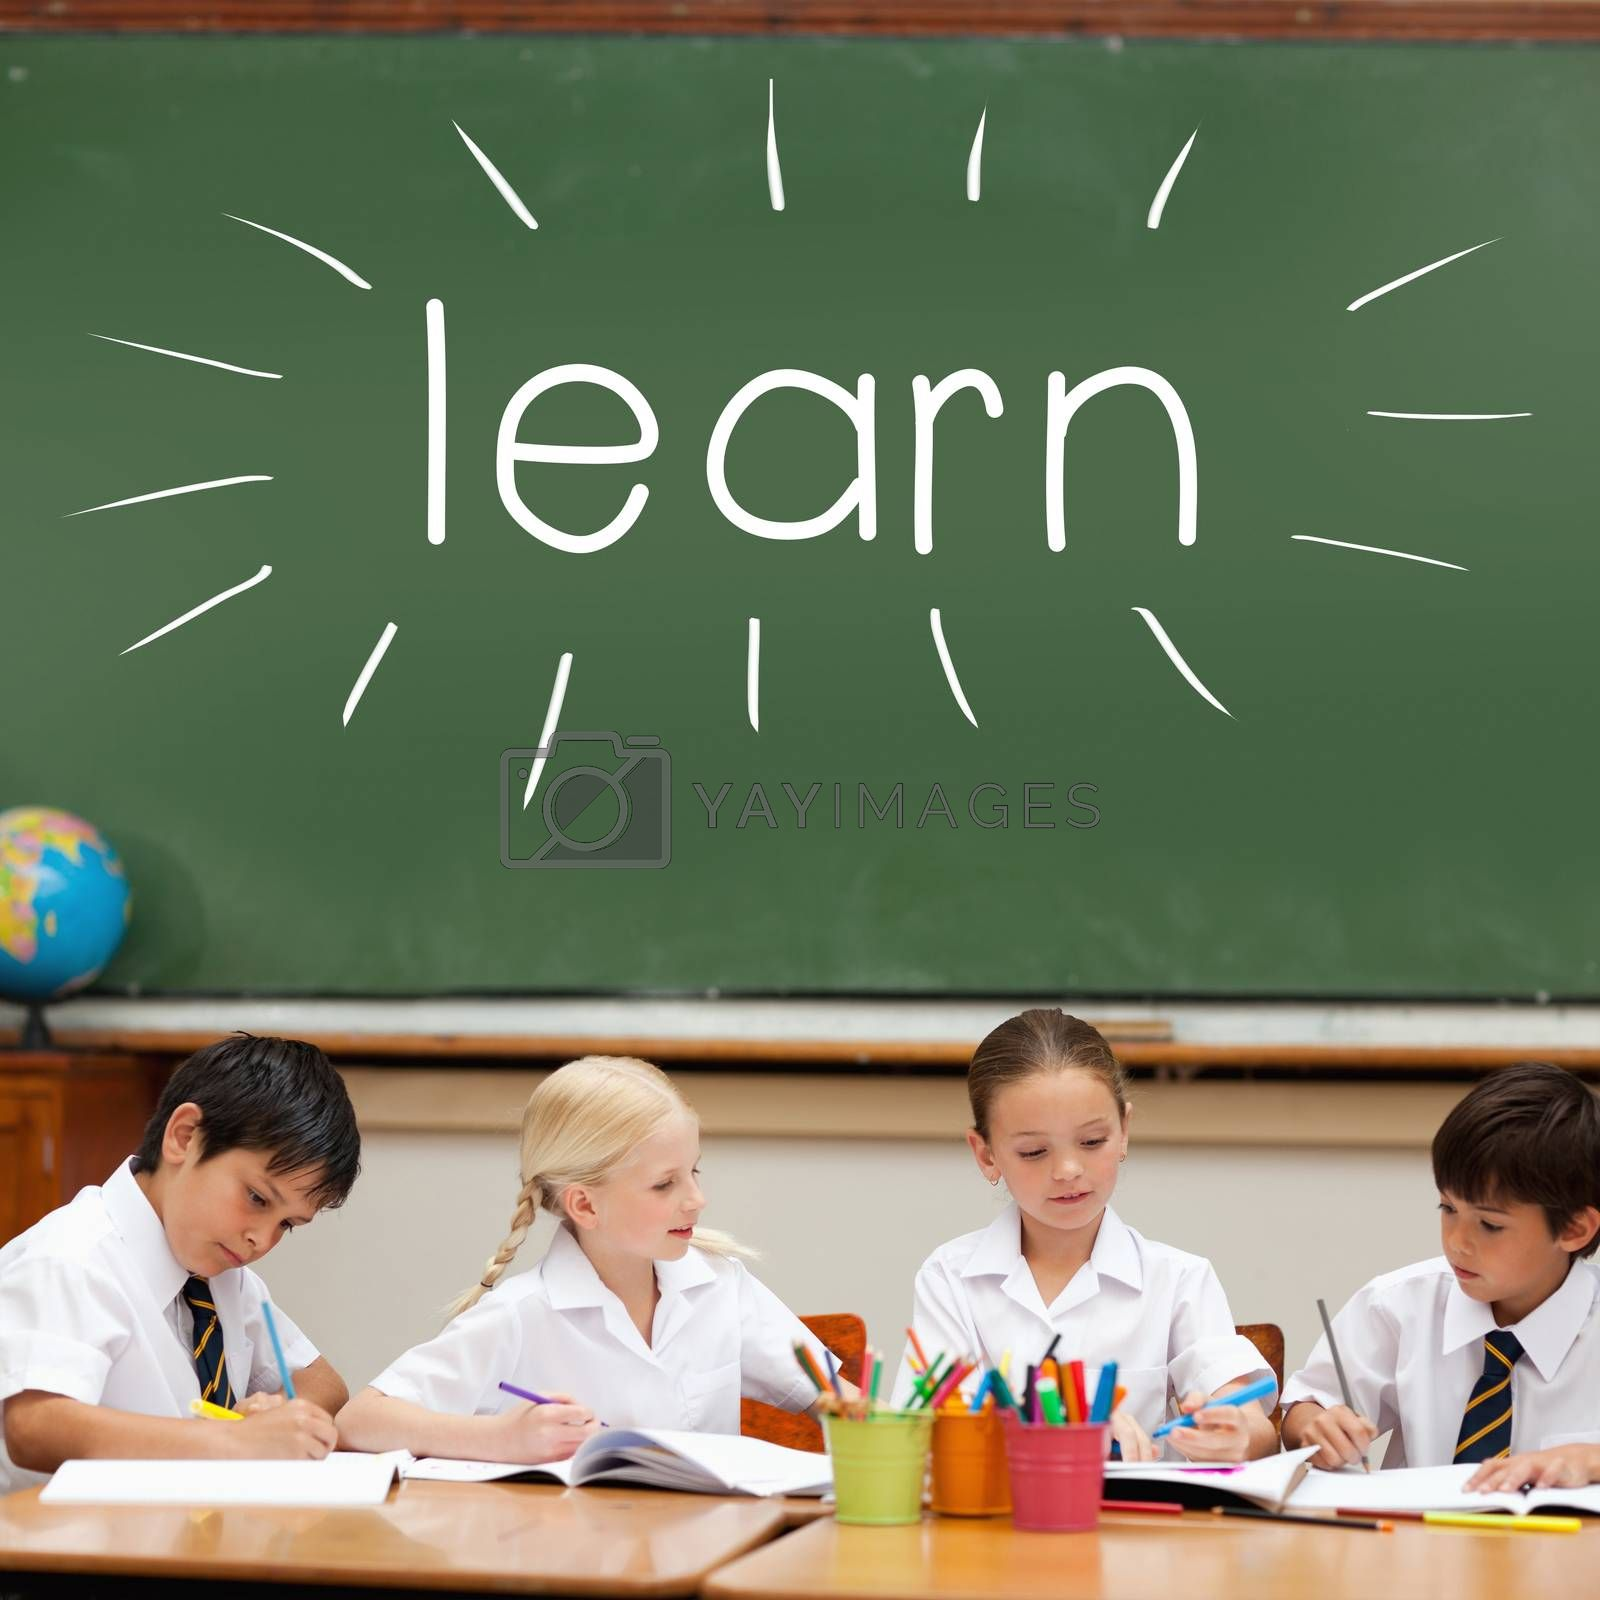 Learn against cute pupils sitting at desk by Wavebreakmedia